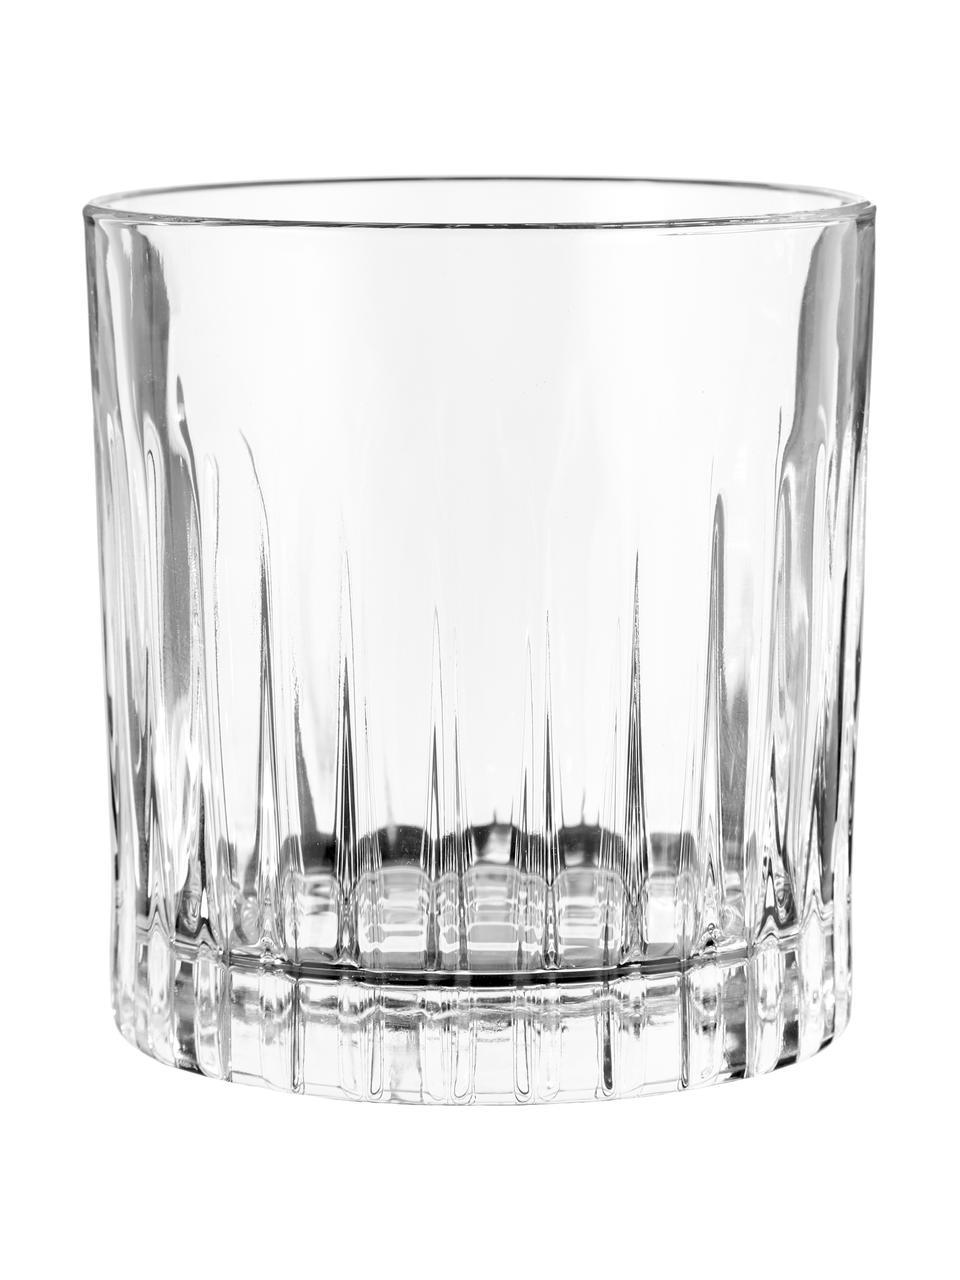 Glazen Timeless met groefreliëf, 6 stuks, Luxion kristalglas, Transparant, Ø 9 x H 9 cm